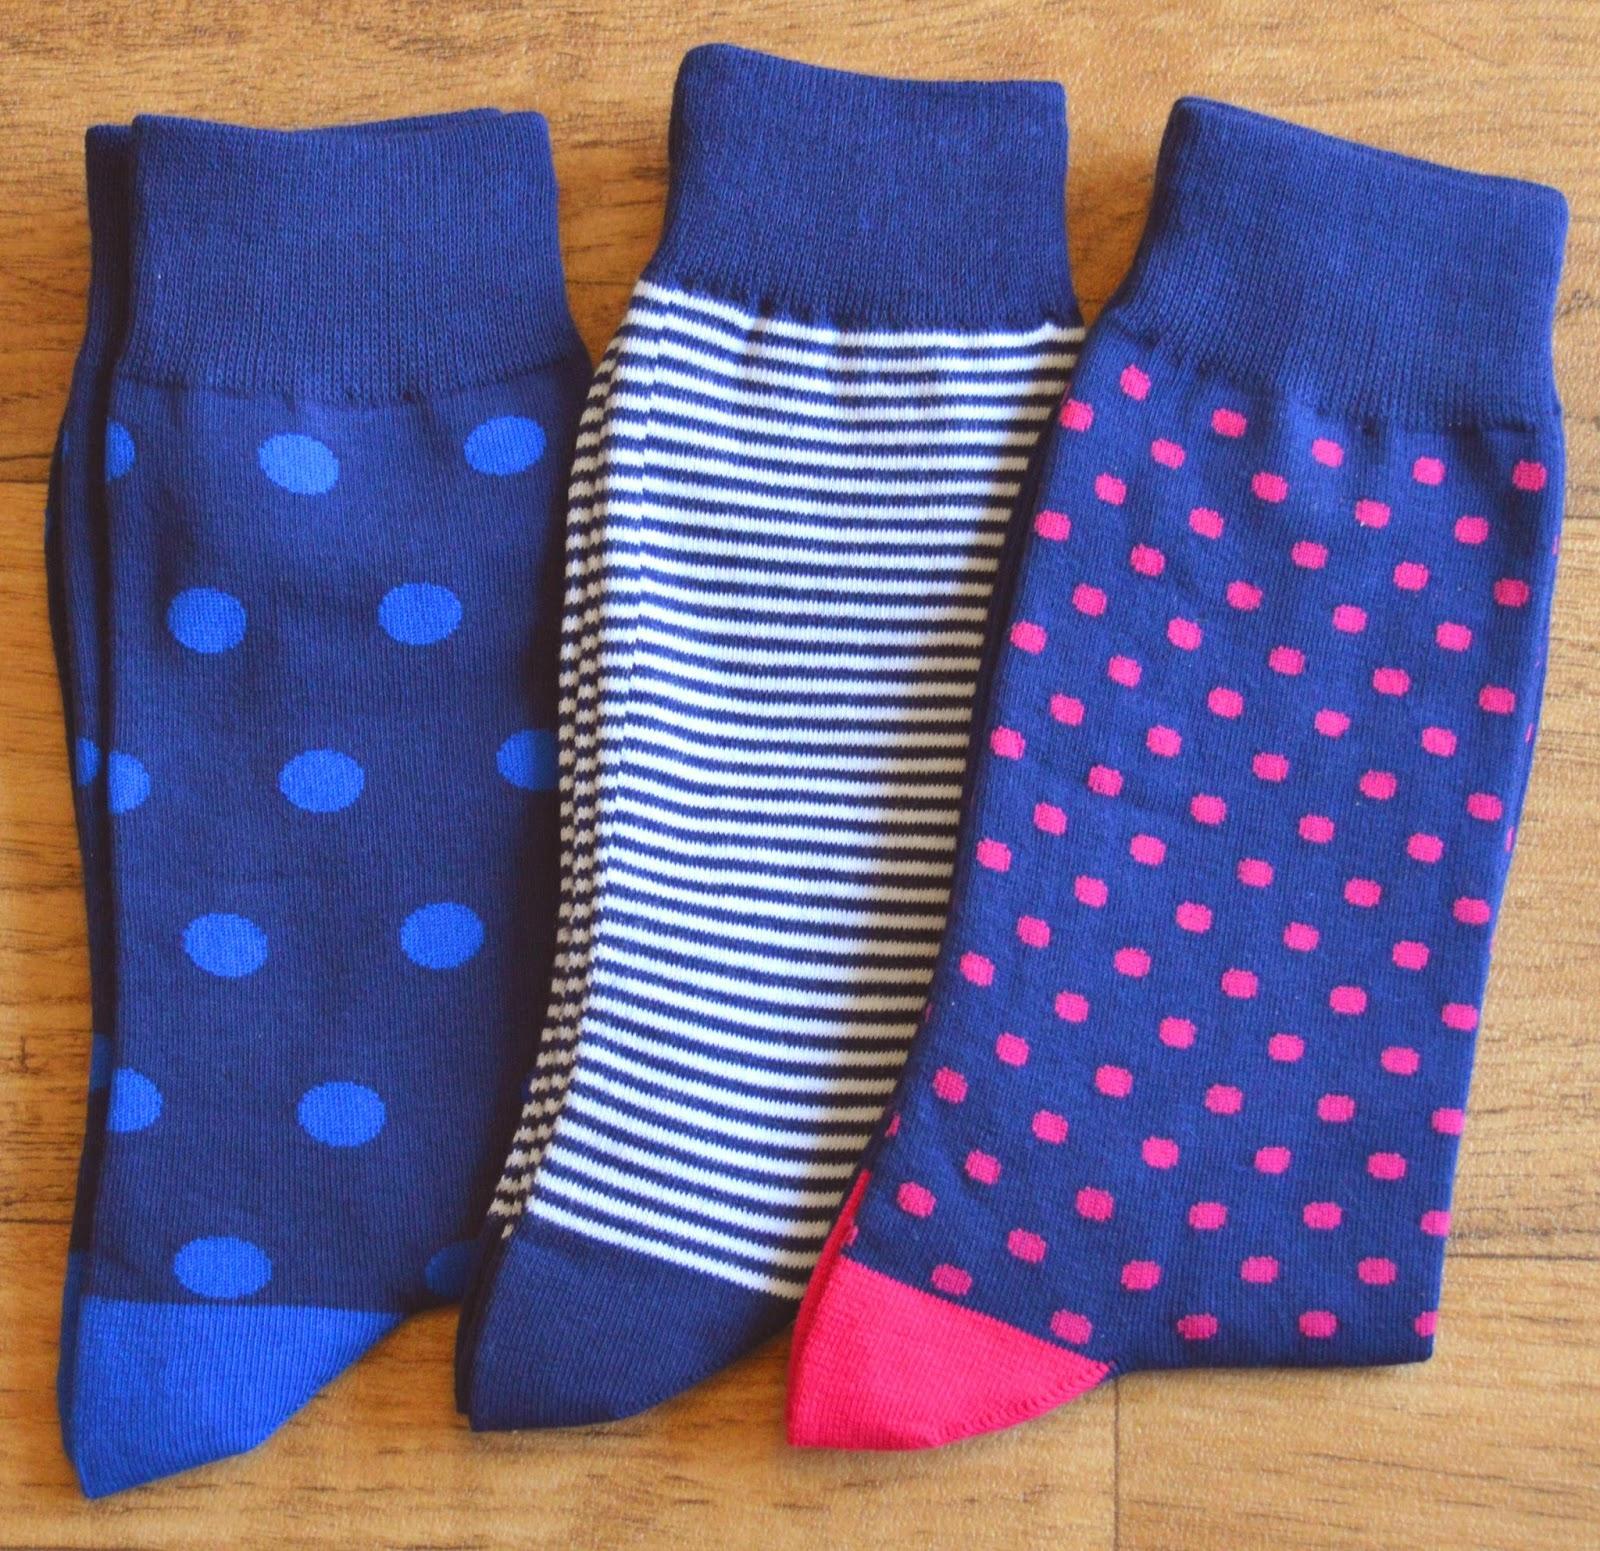 Sock review of Rock My Socks